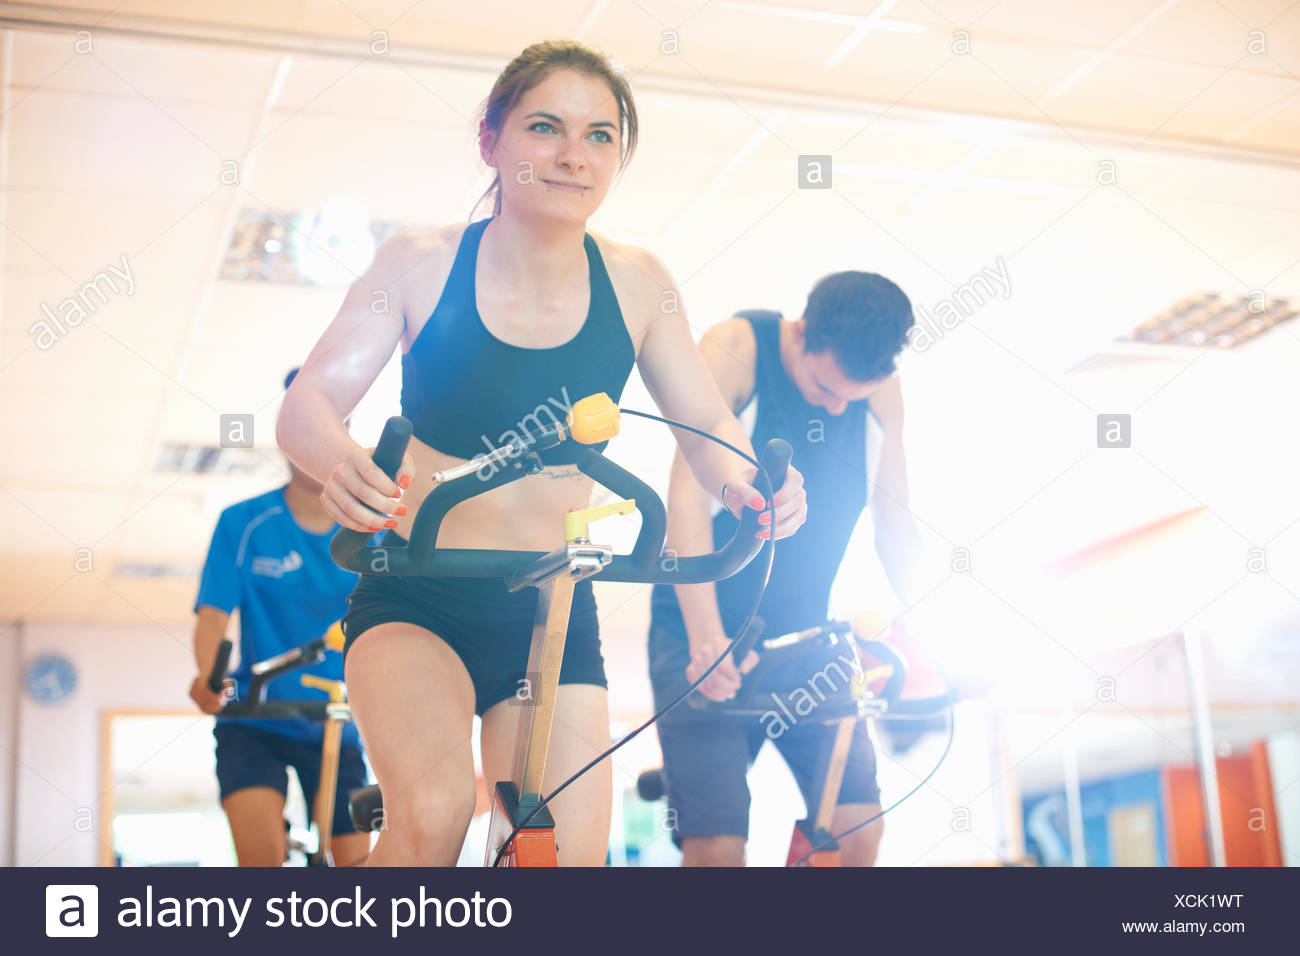 Young woman on exercise bike Stock Photo